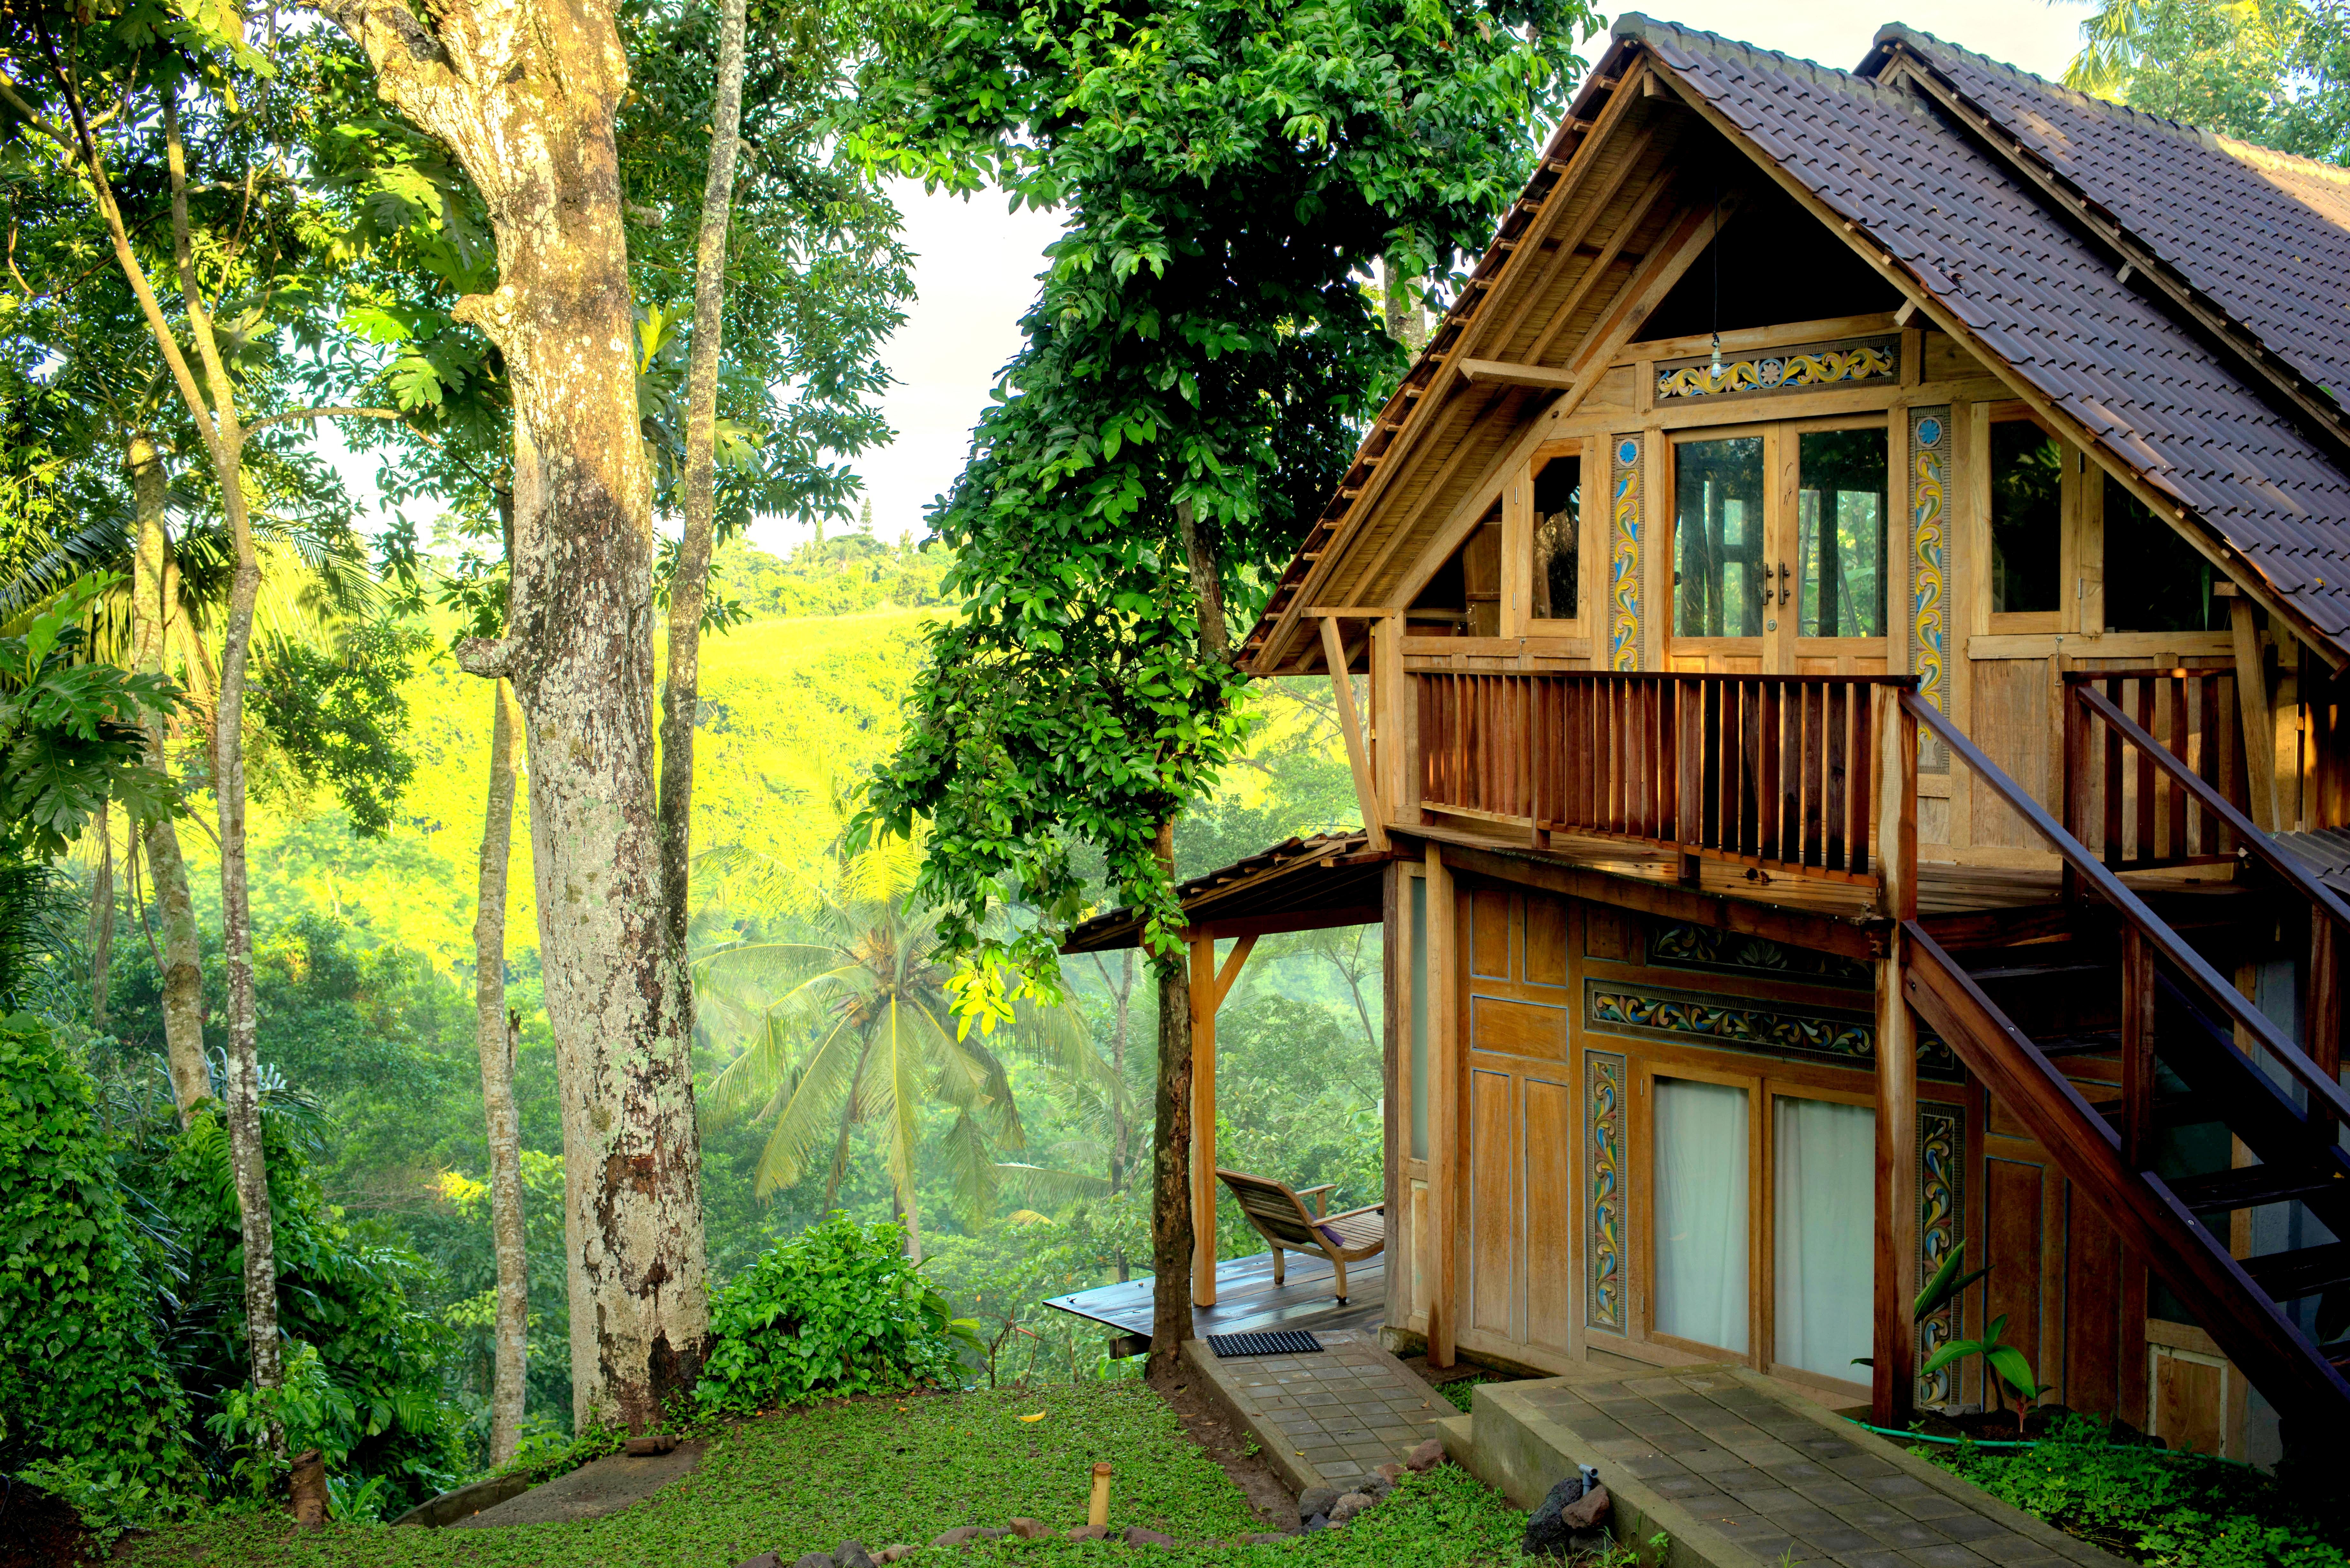 Prashanti Eco Hotel